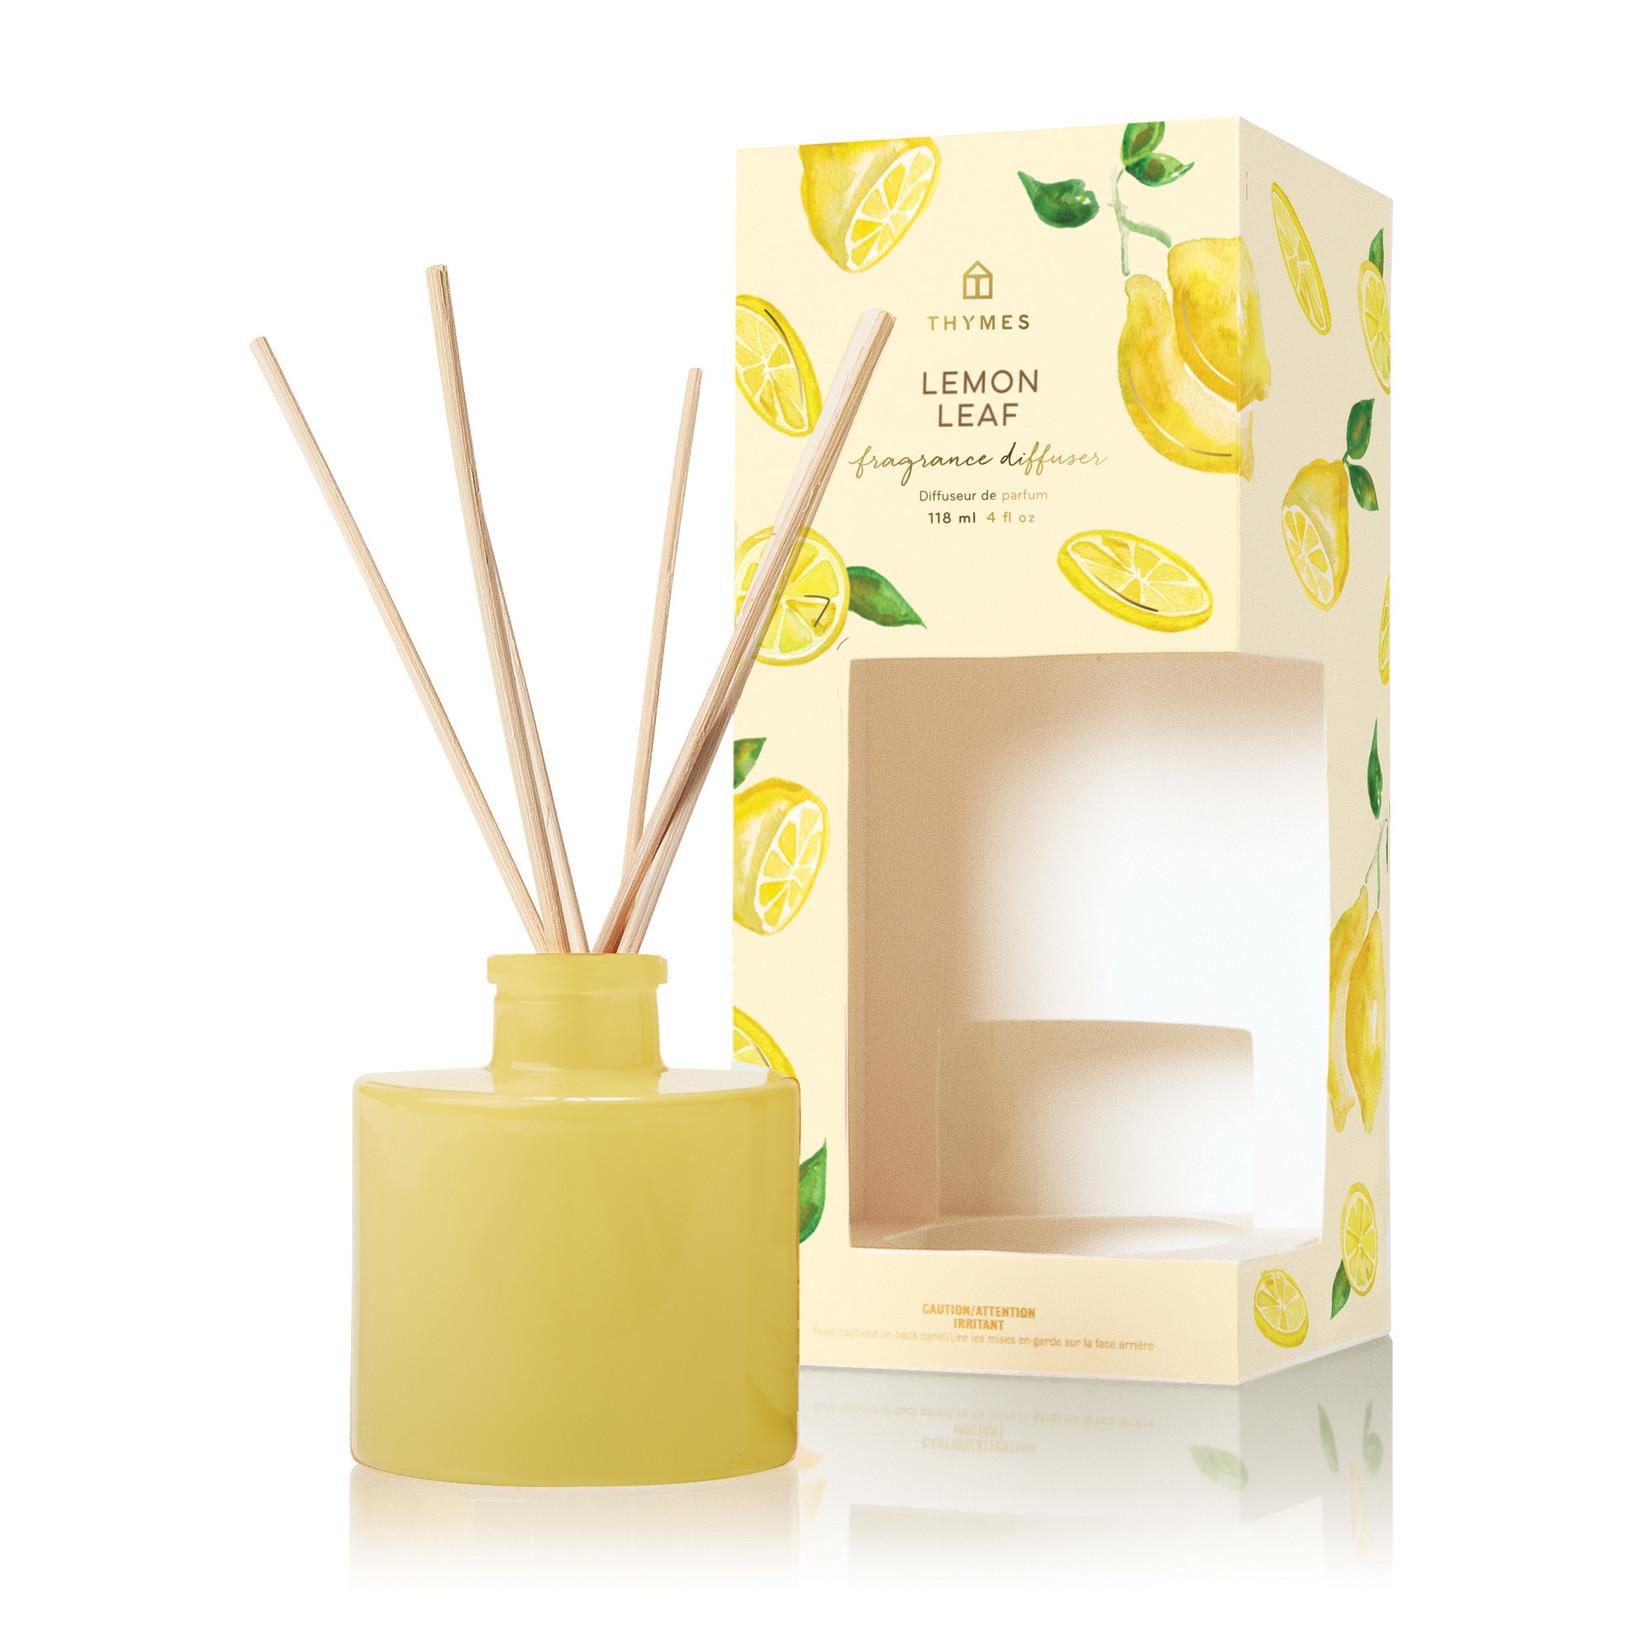 Thymes Lemon Leaf Aromatic Diffuser